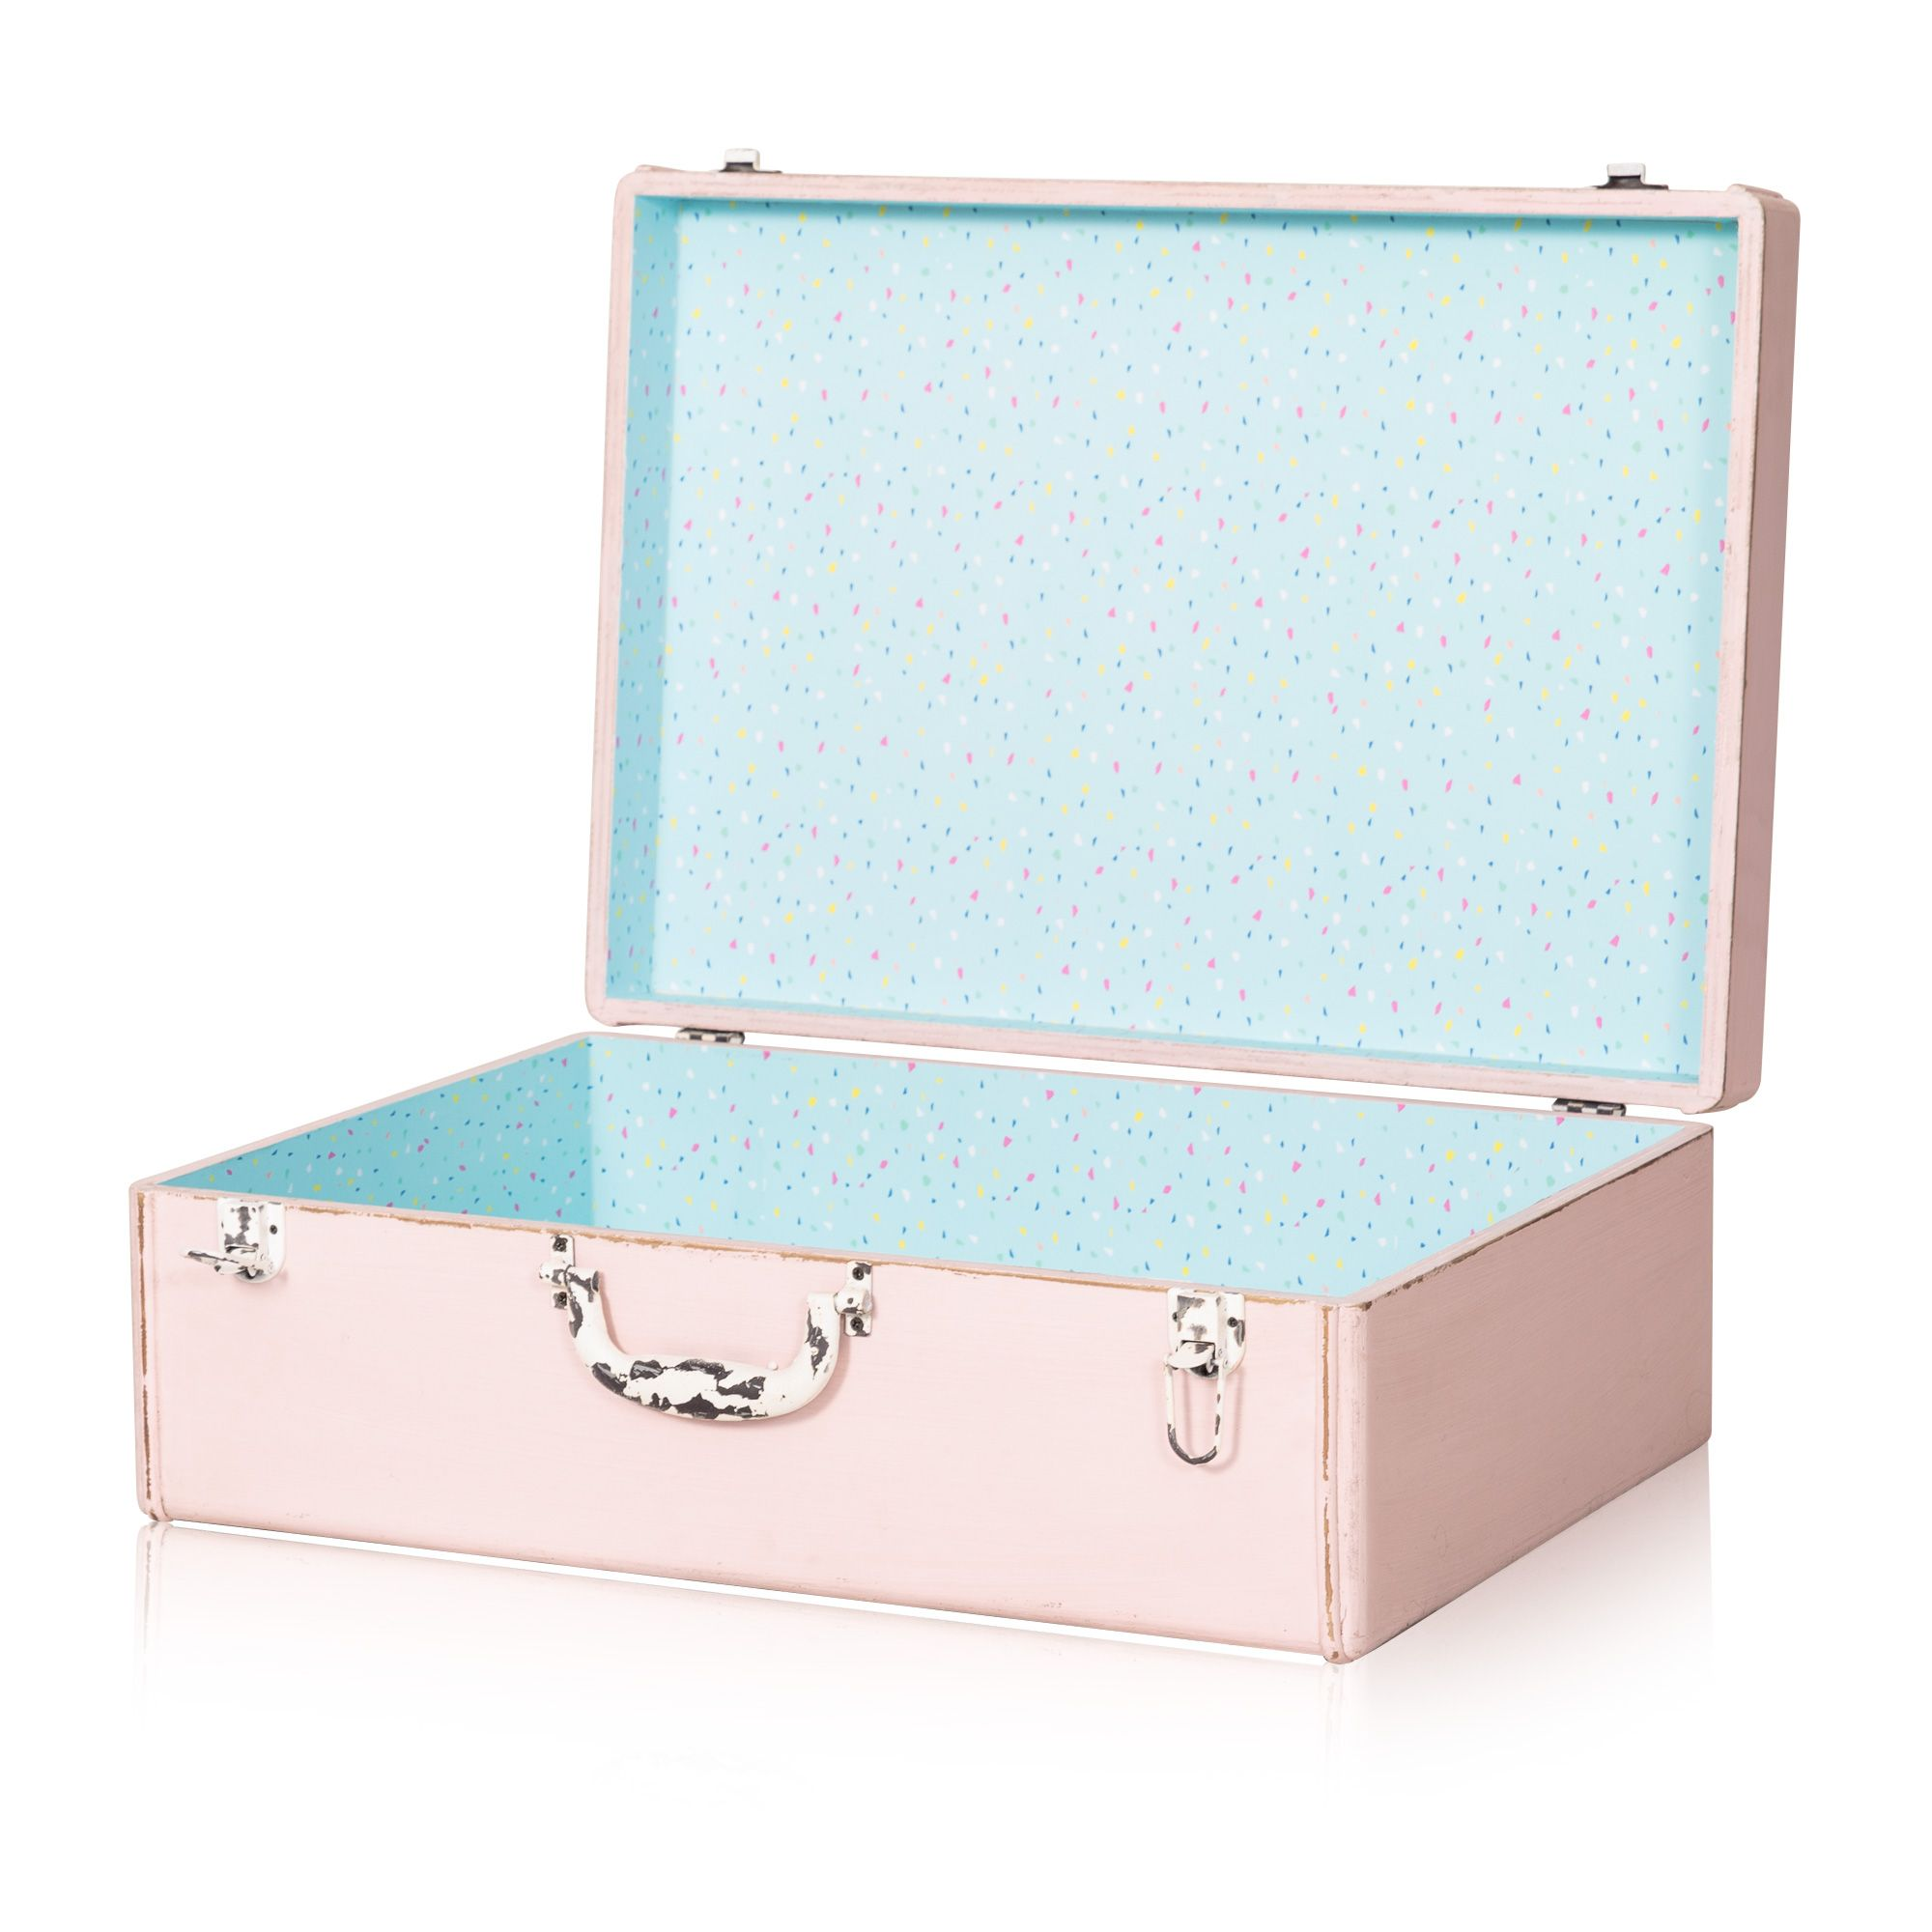 Buy The Large Loft Decorative Storage Suitcase At Oliver Bonas. Enjoy Free  UK Standard Delivery